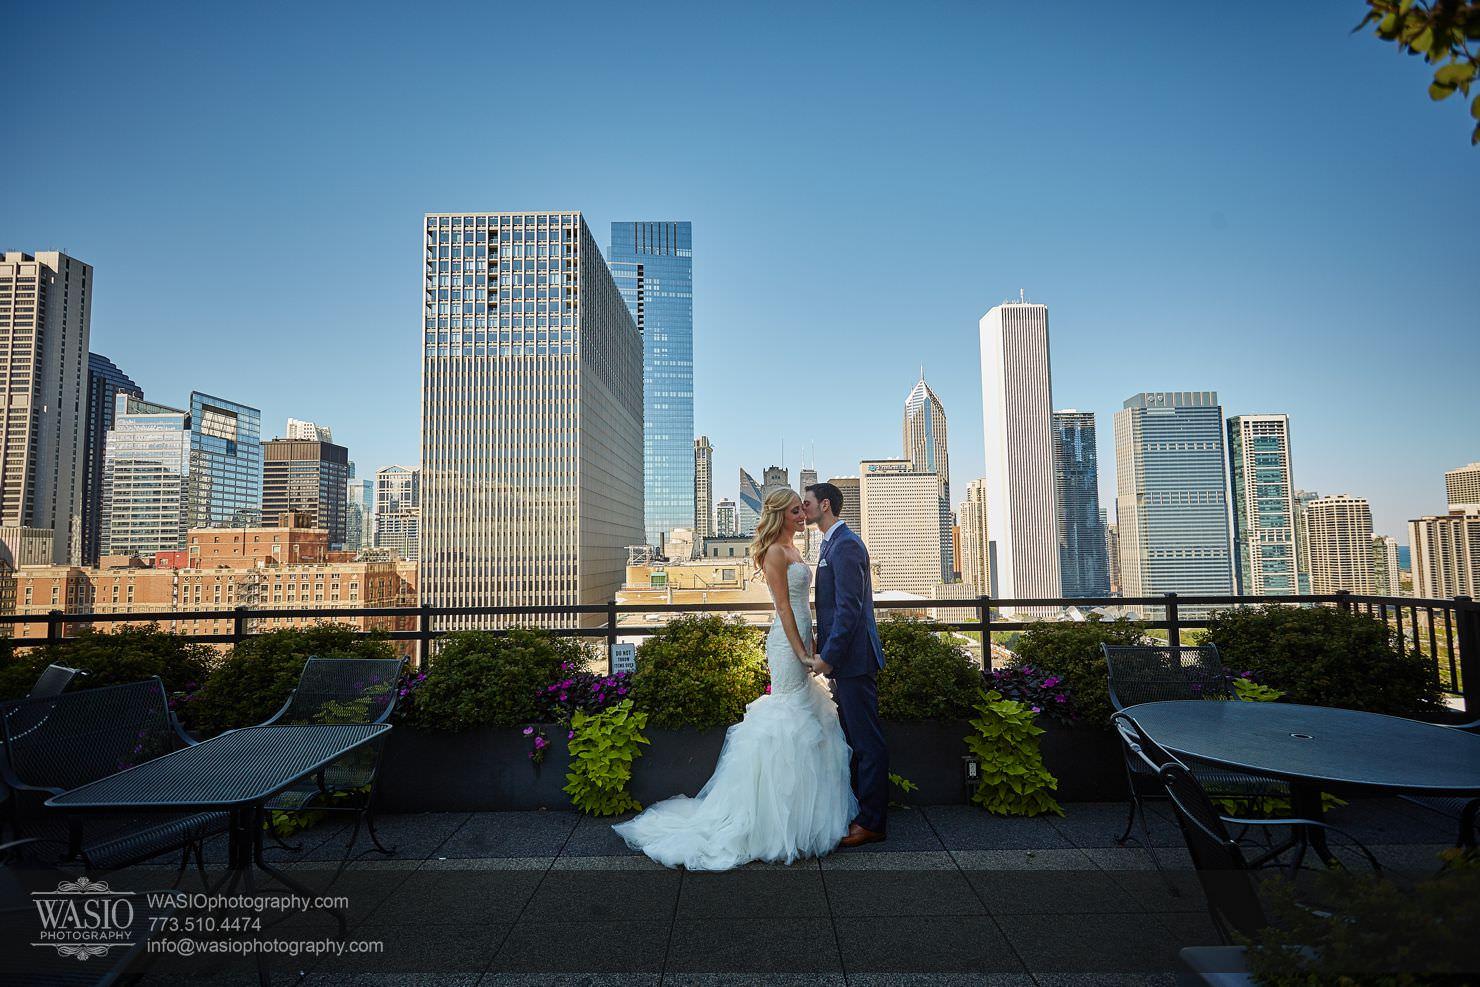 03_Chicago-Gallery-Wedding_3P4C1077 Chicago Gallery Wedding - Courtney + Danny